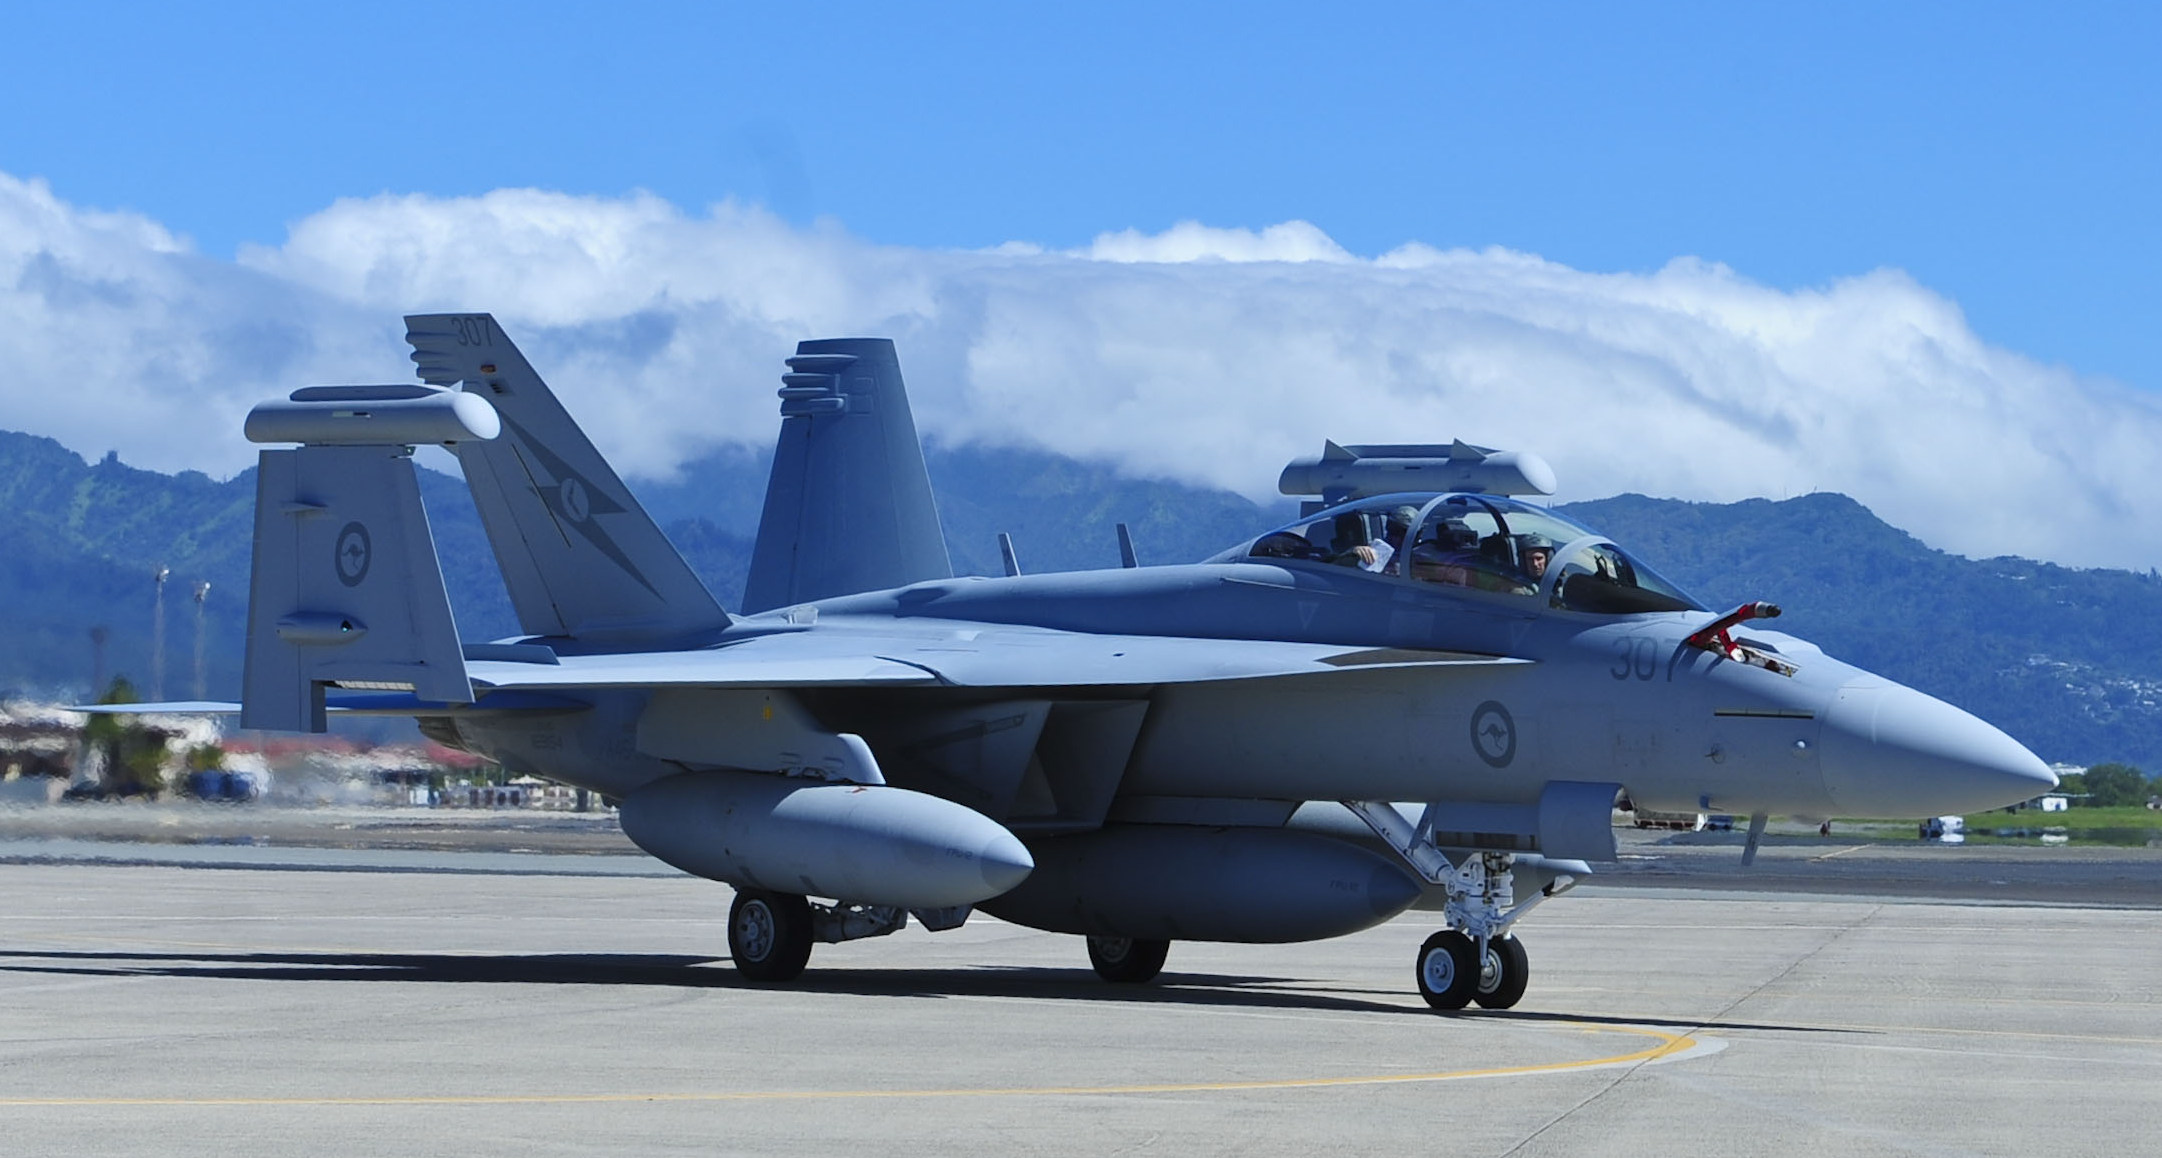 Australian_EA-18G_at_Joint_Base_Pearl_Harbor-Hickam_in_2017.jpg